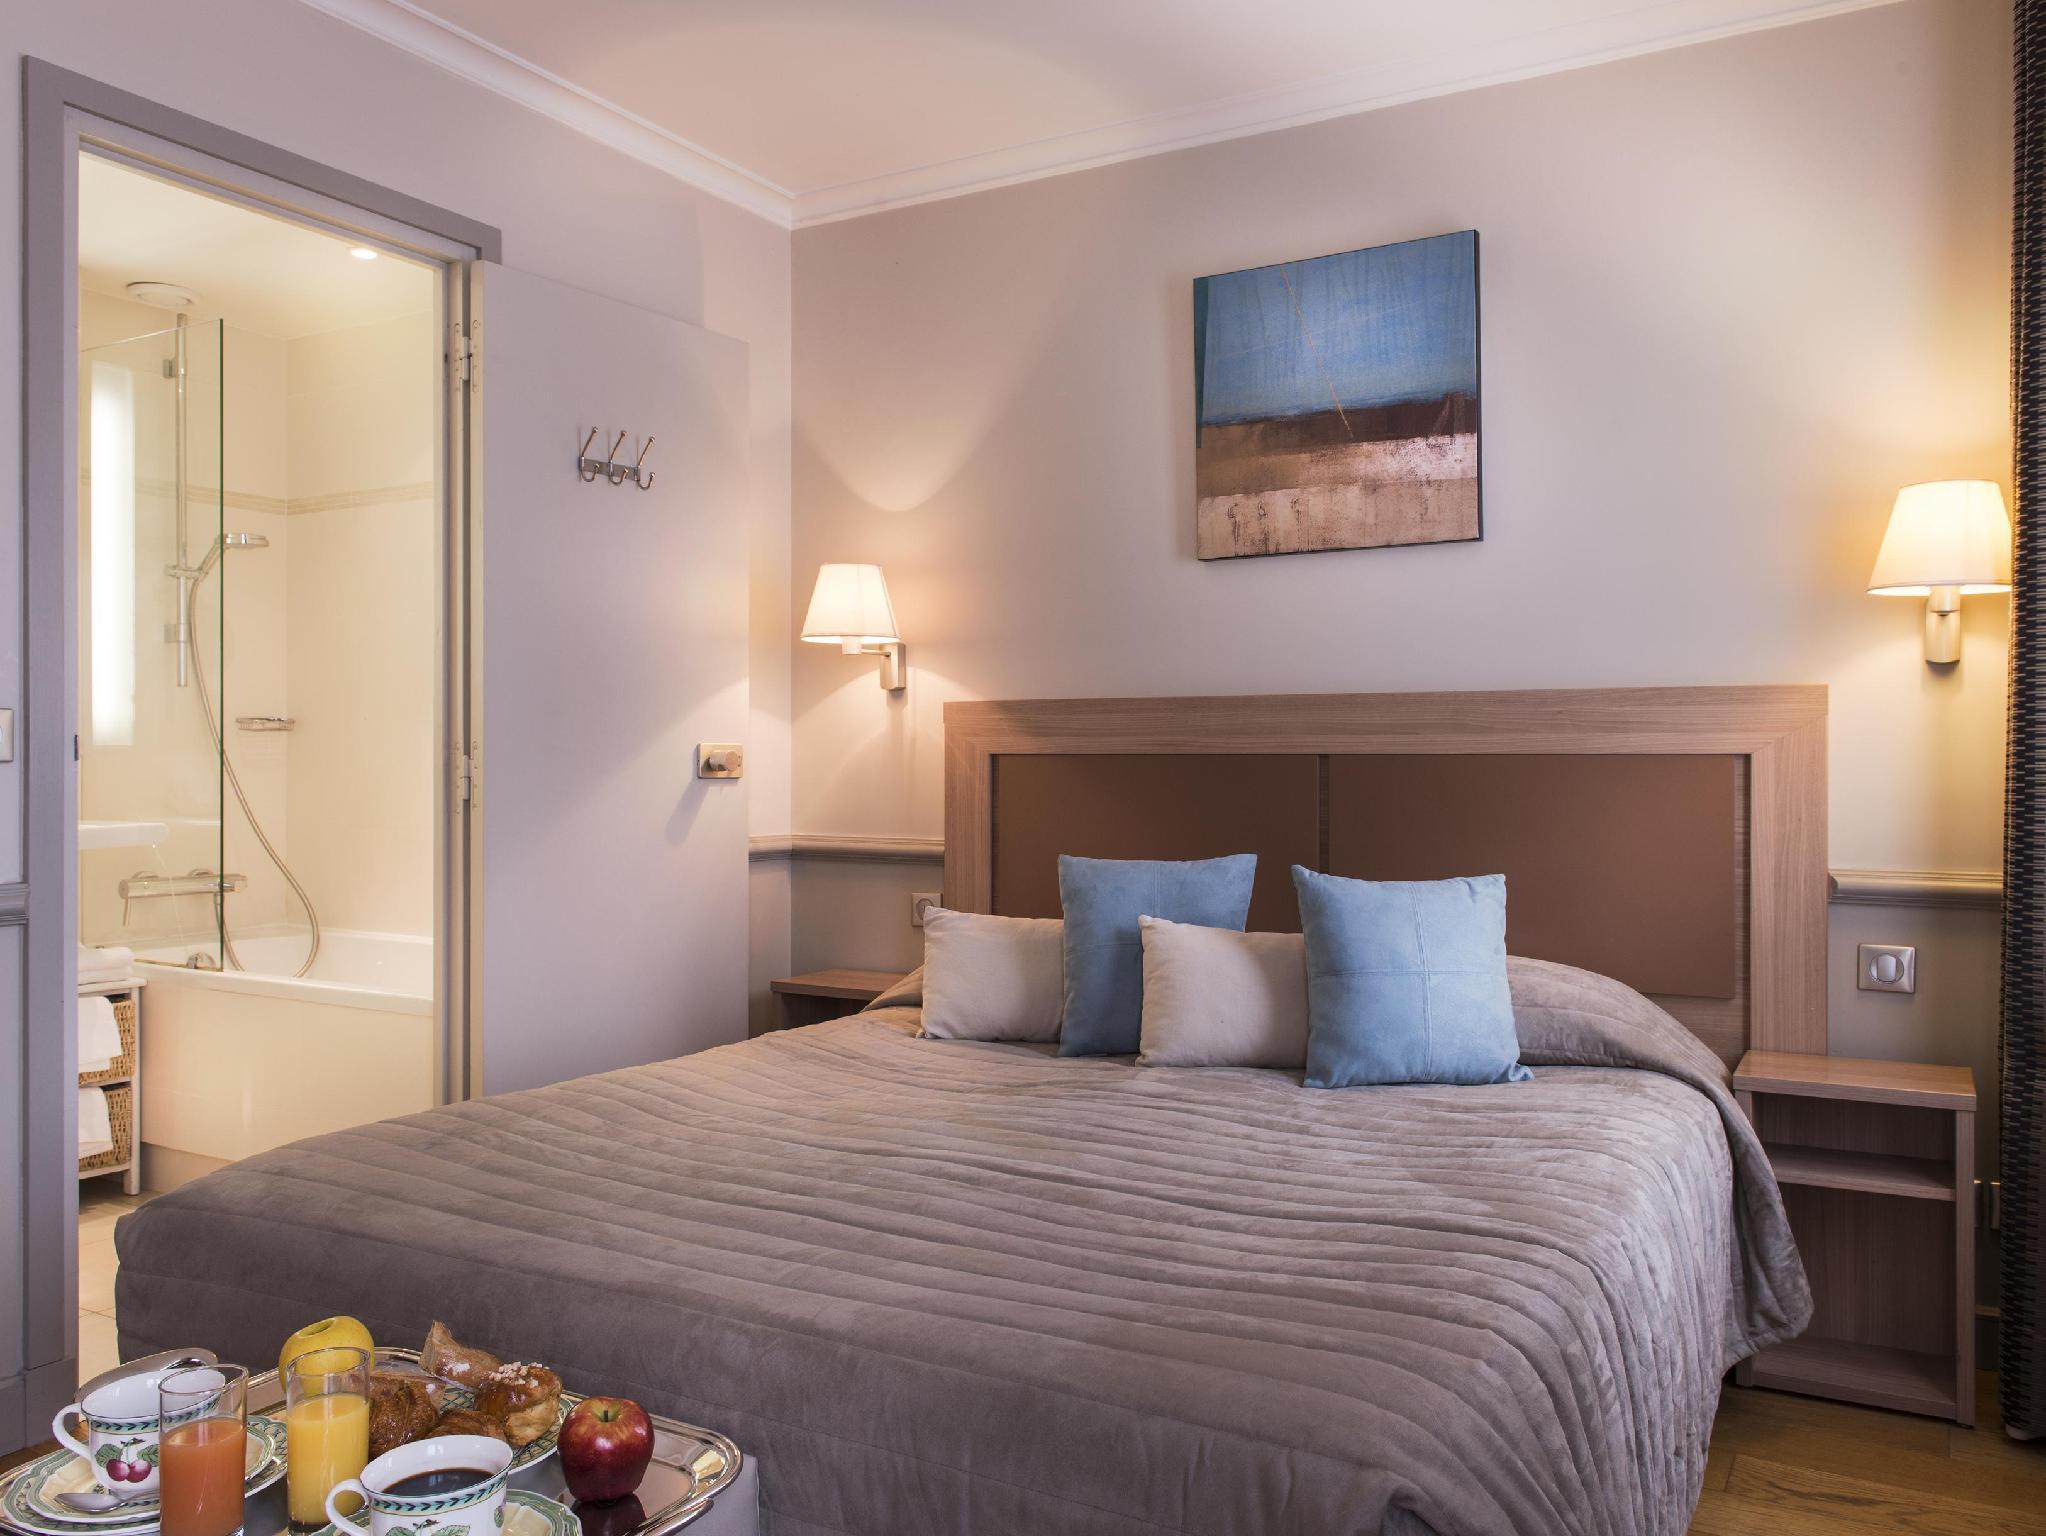 Hotel Apollinaire - Hotell och Boende i Frankrike i Europa